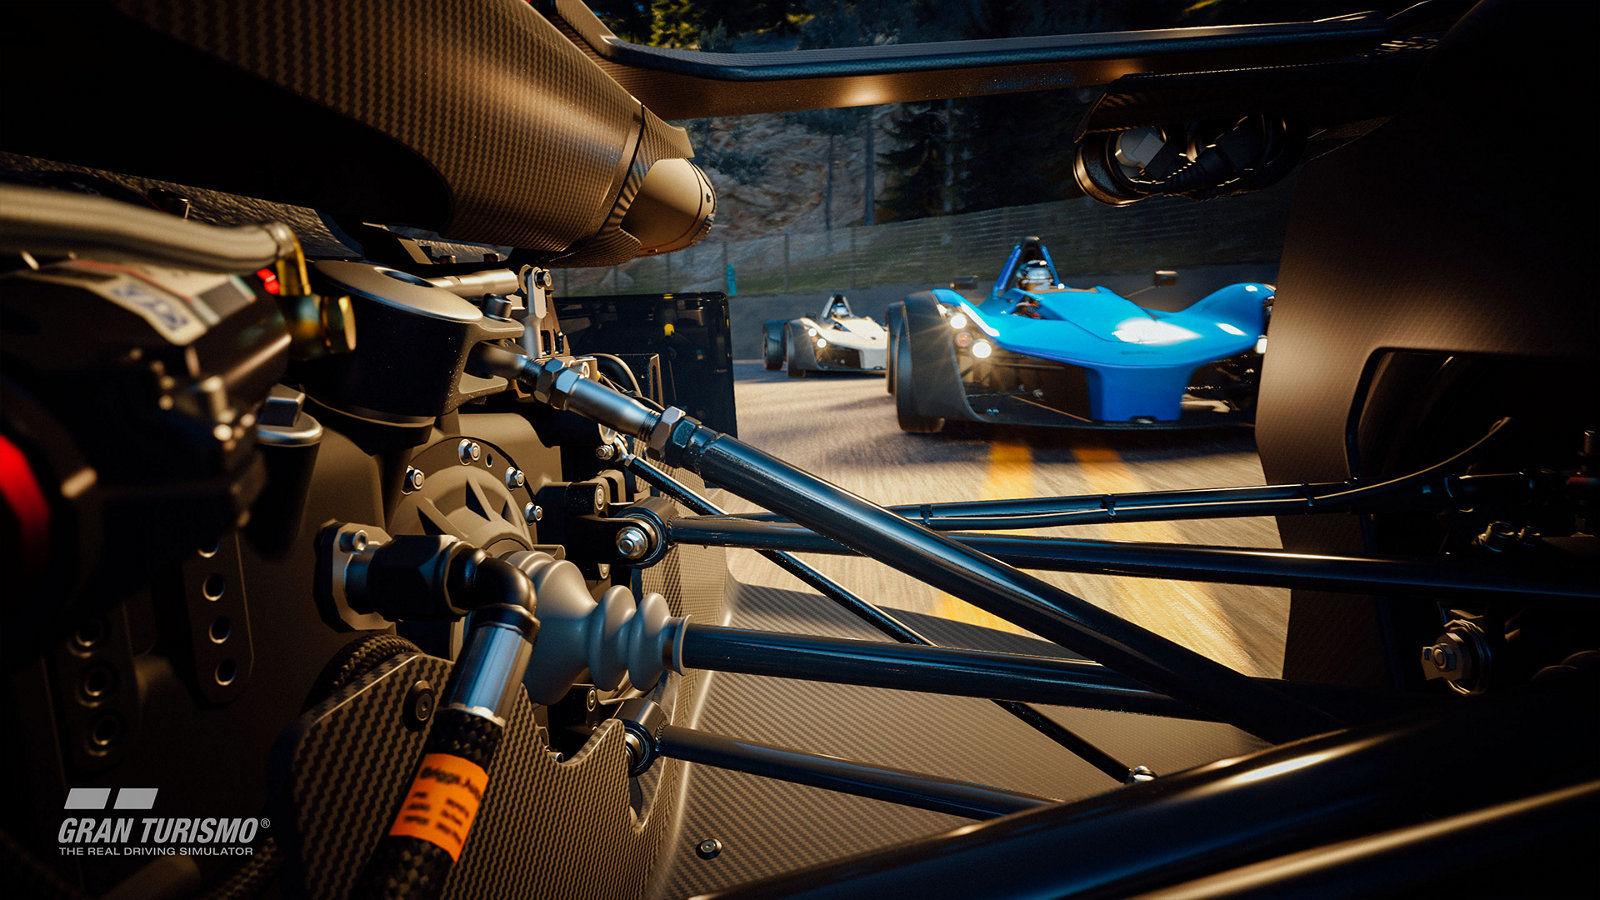 Gran Turismo 7 release date postponed